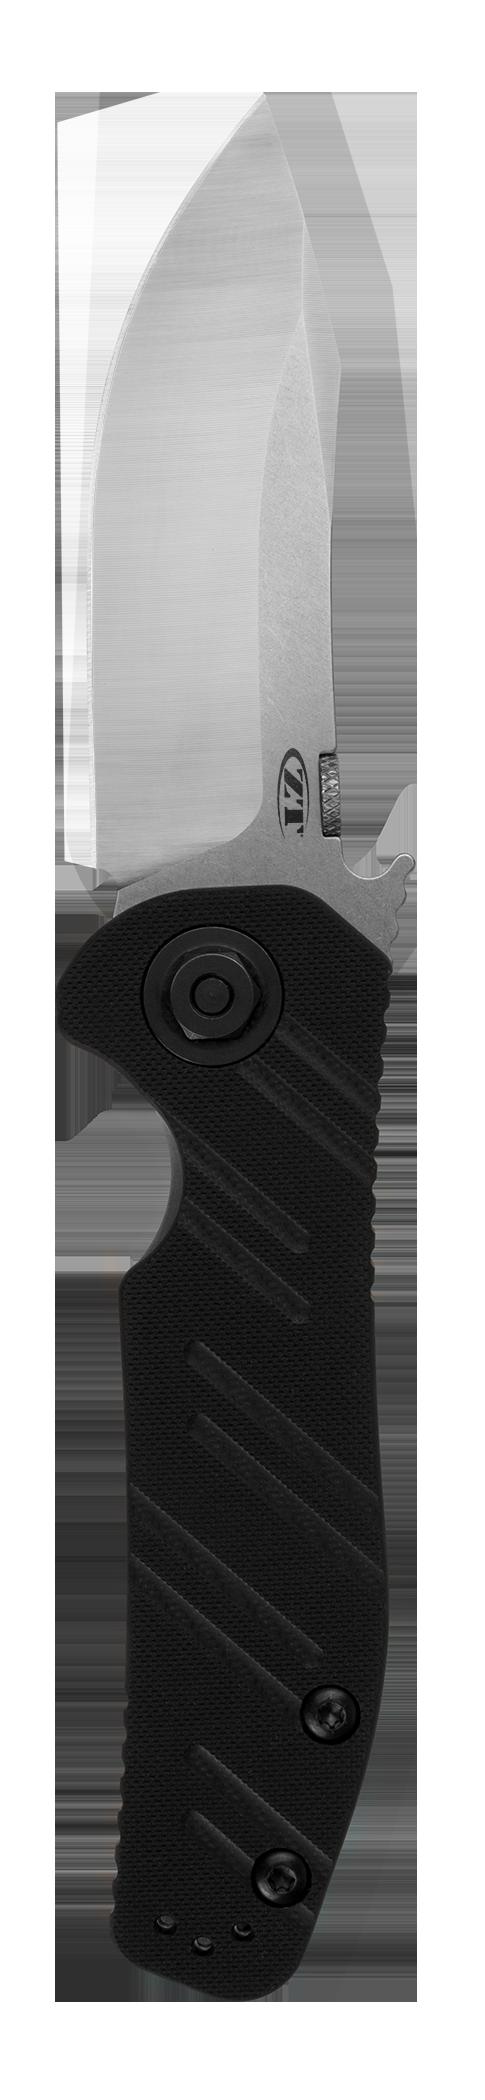 Zero Tolerance 0630 Emerson Black G10 Titanium Frame Knife